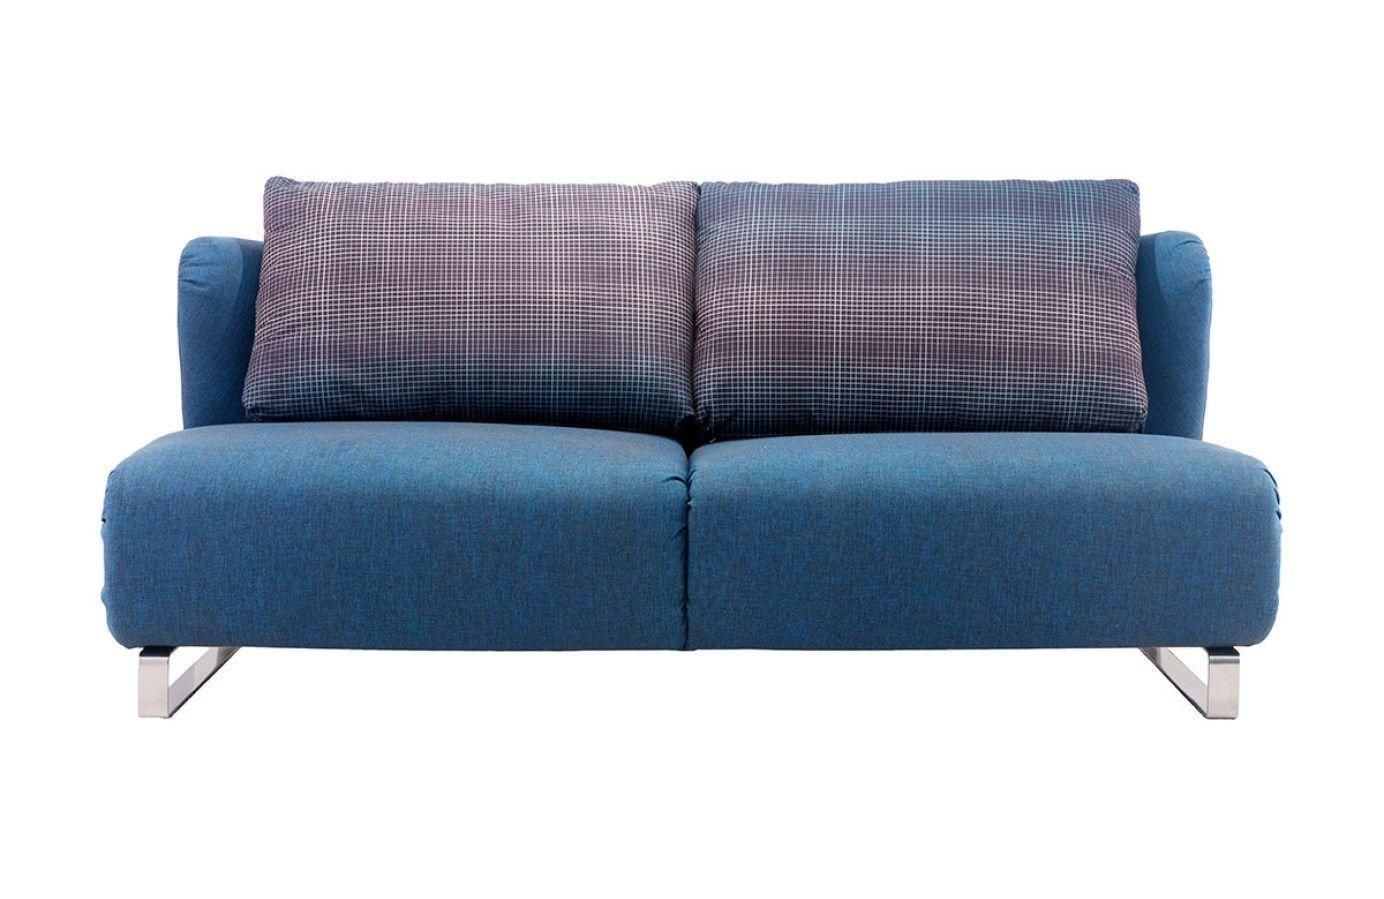 vintage style sleeper sofa. Black Bedroom Furniture Sets. Home Design Ideas